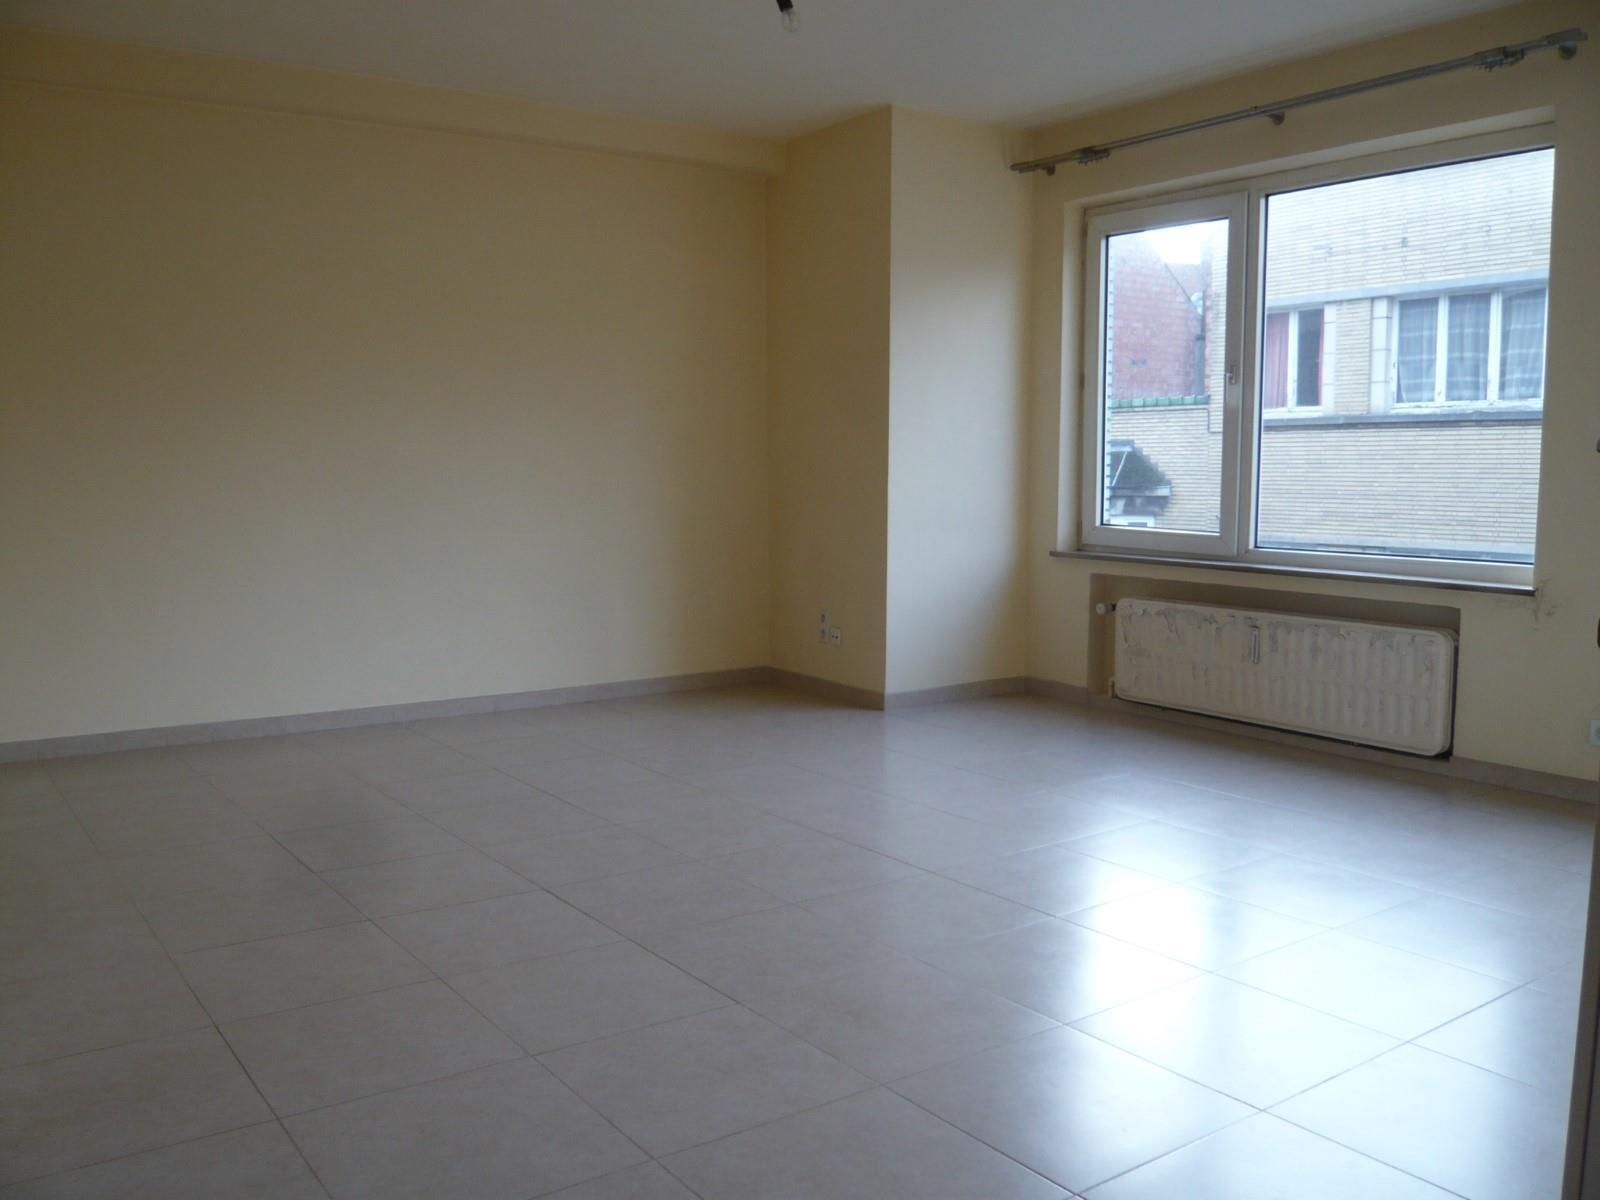 Appartement - Ganshoren - #3566980-2